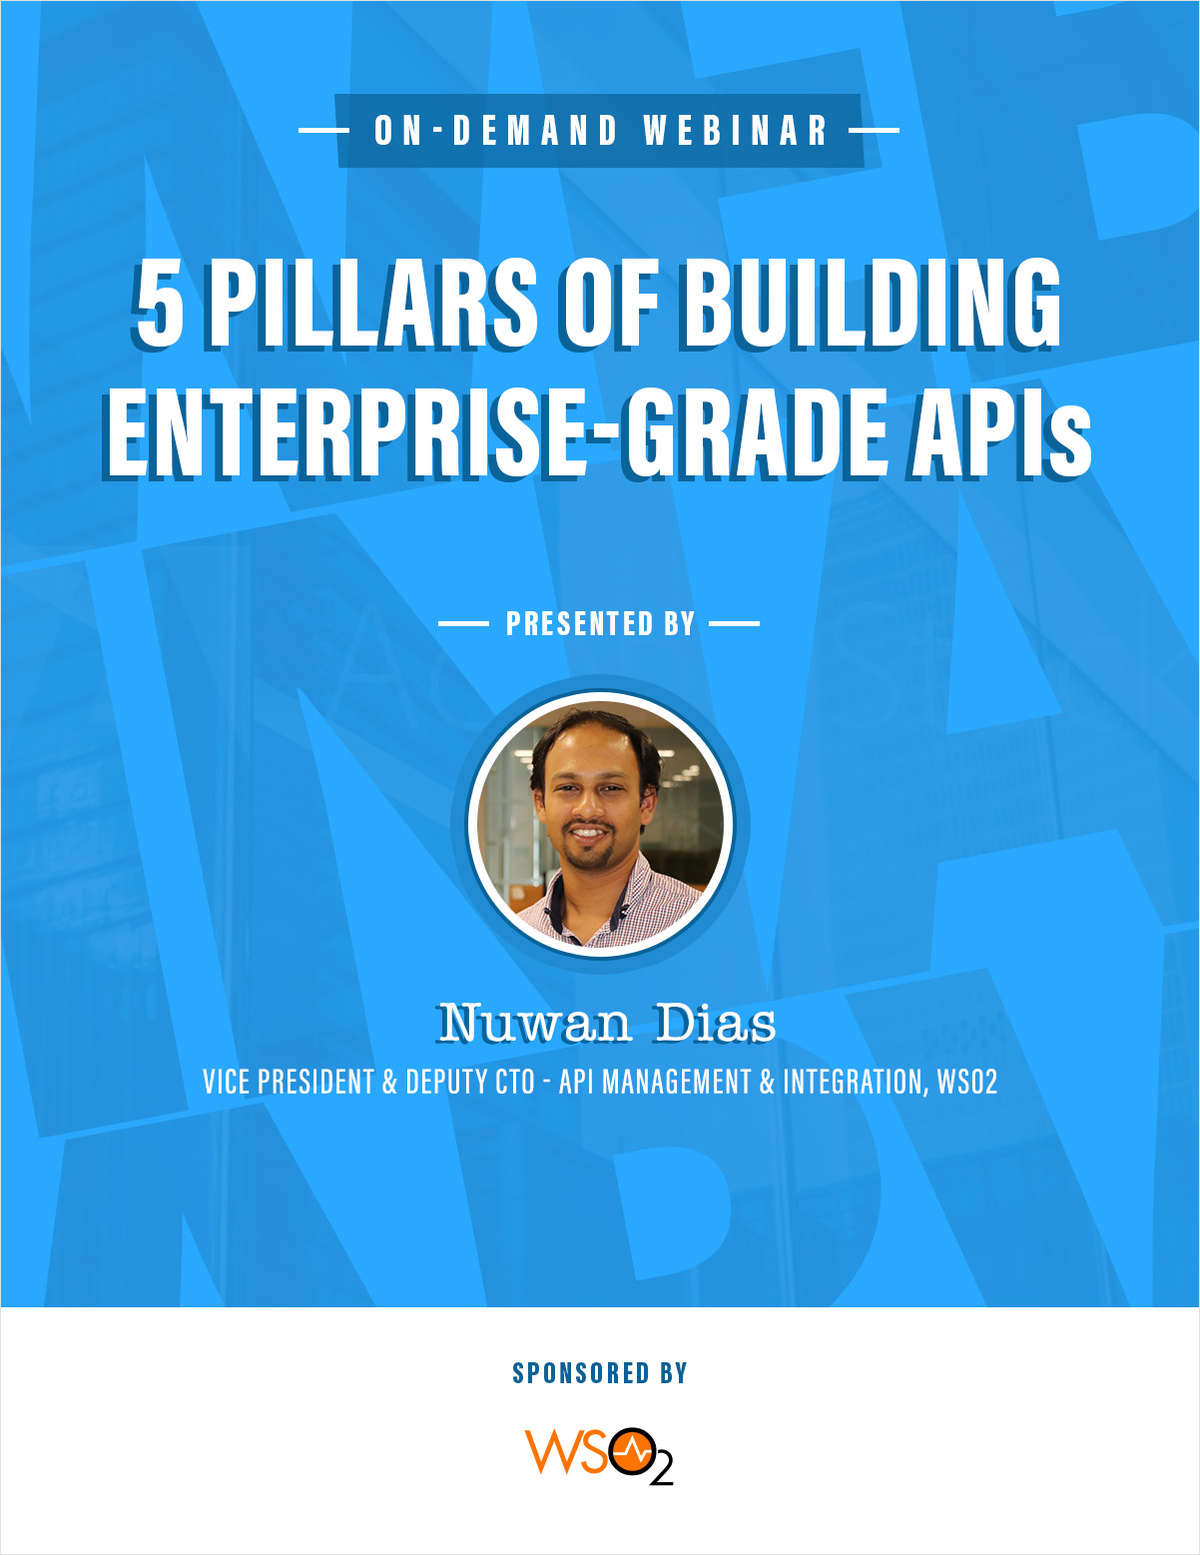 5 Pillars of Building Enterprise-Grade APIs